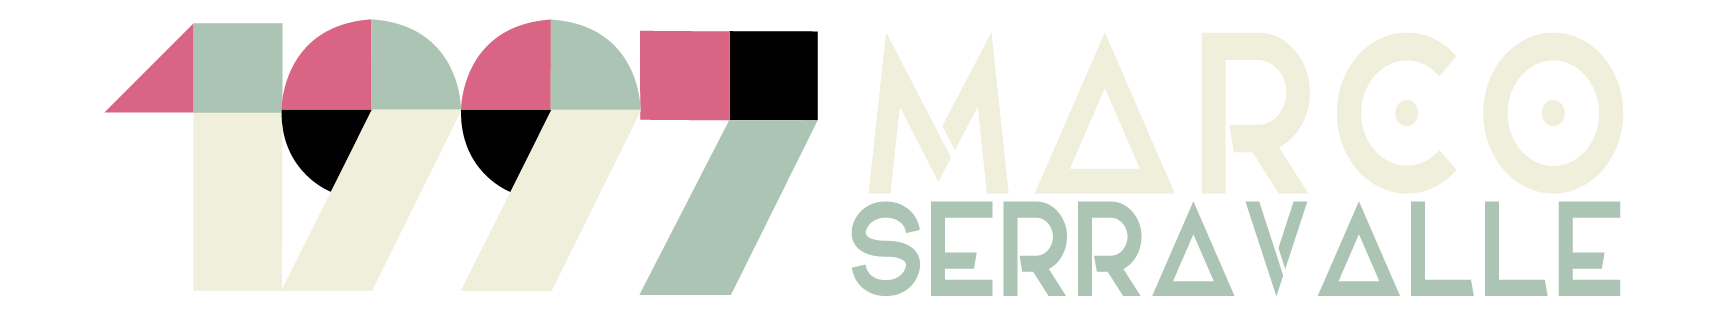 MARCO SERRAVALLE